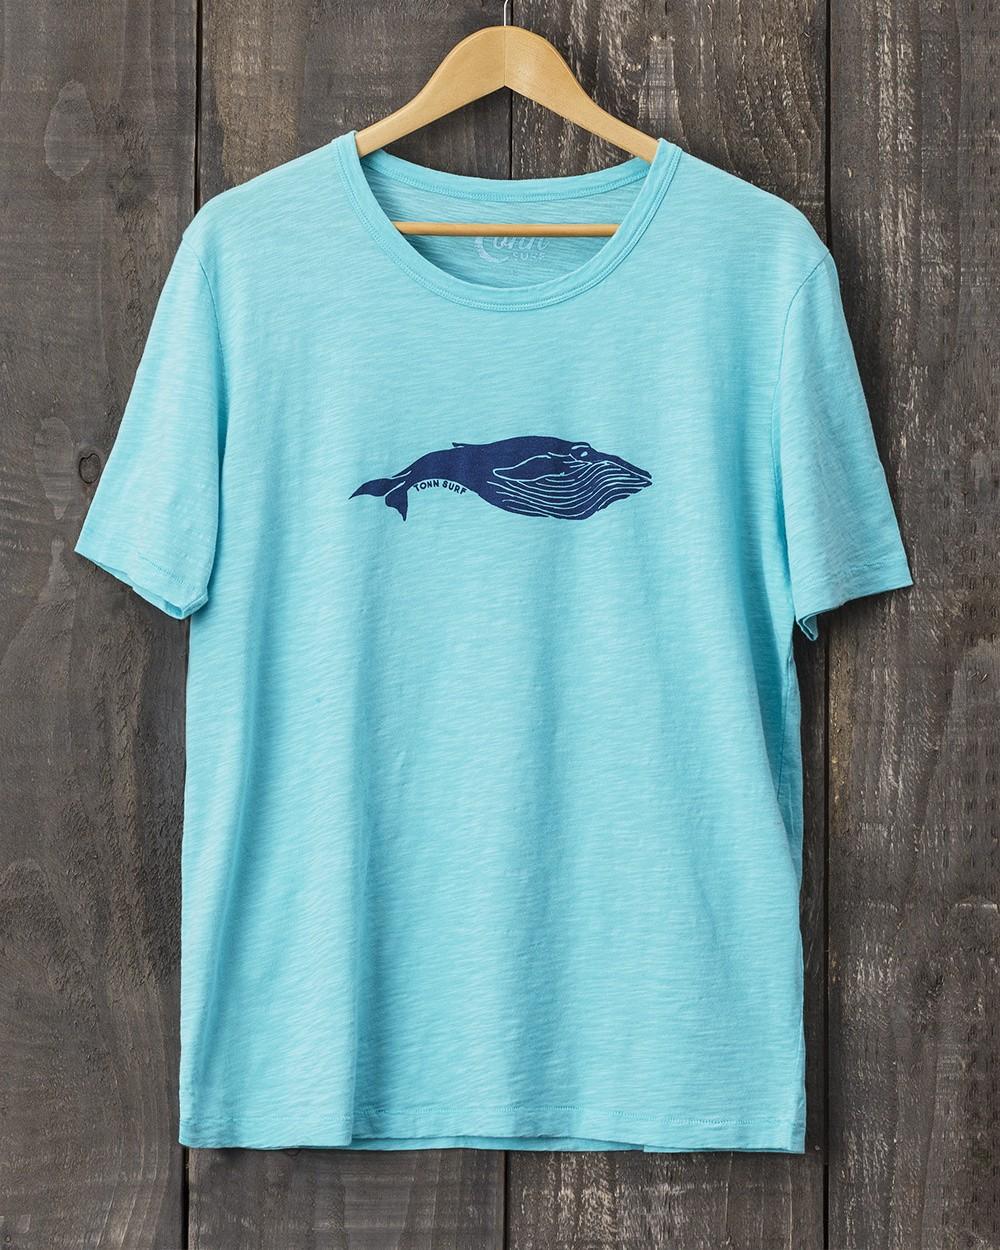 Tonn Organic Cotton Whale T-Shirt - Turquoise